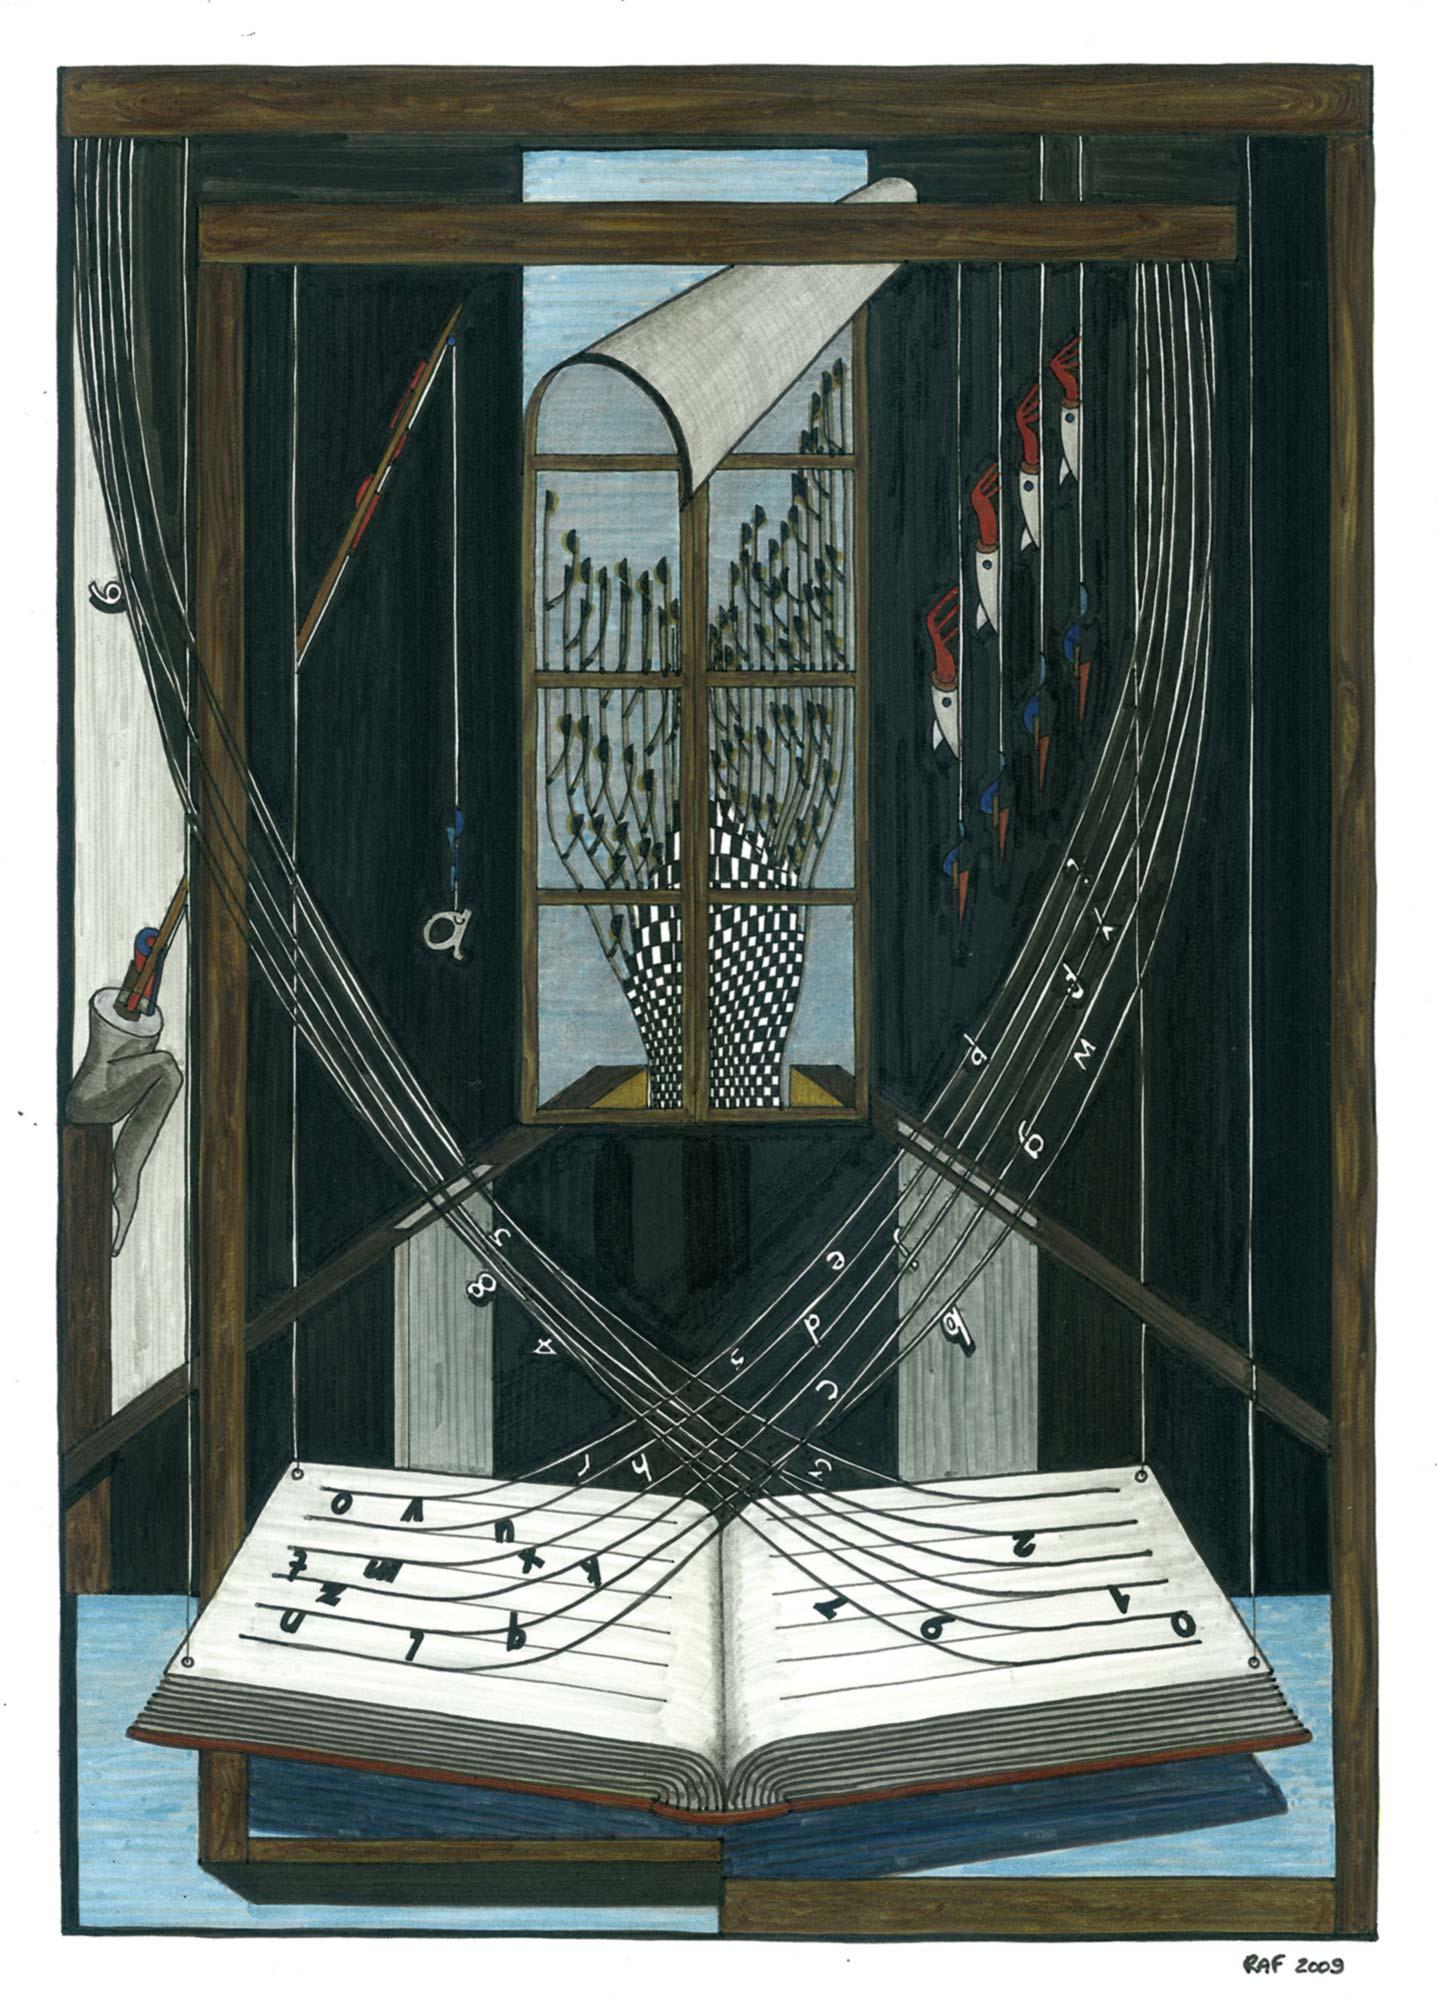 La fenêtre, dessin, Raf Listowski, 2009